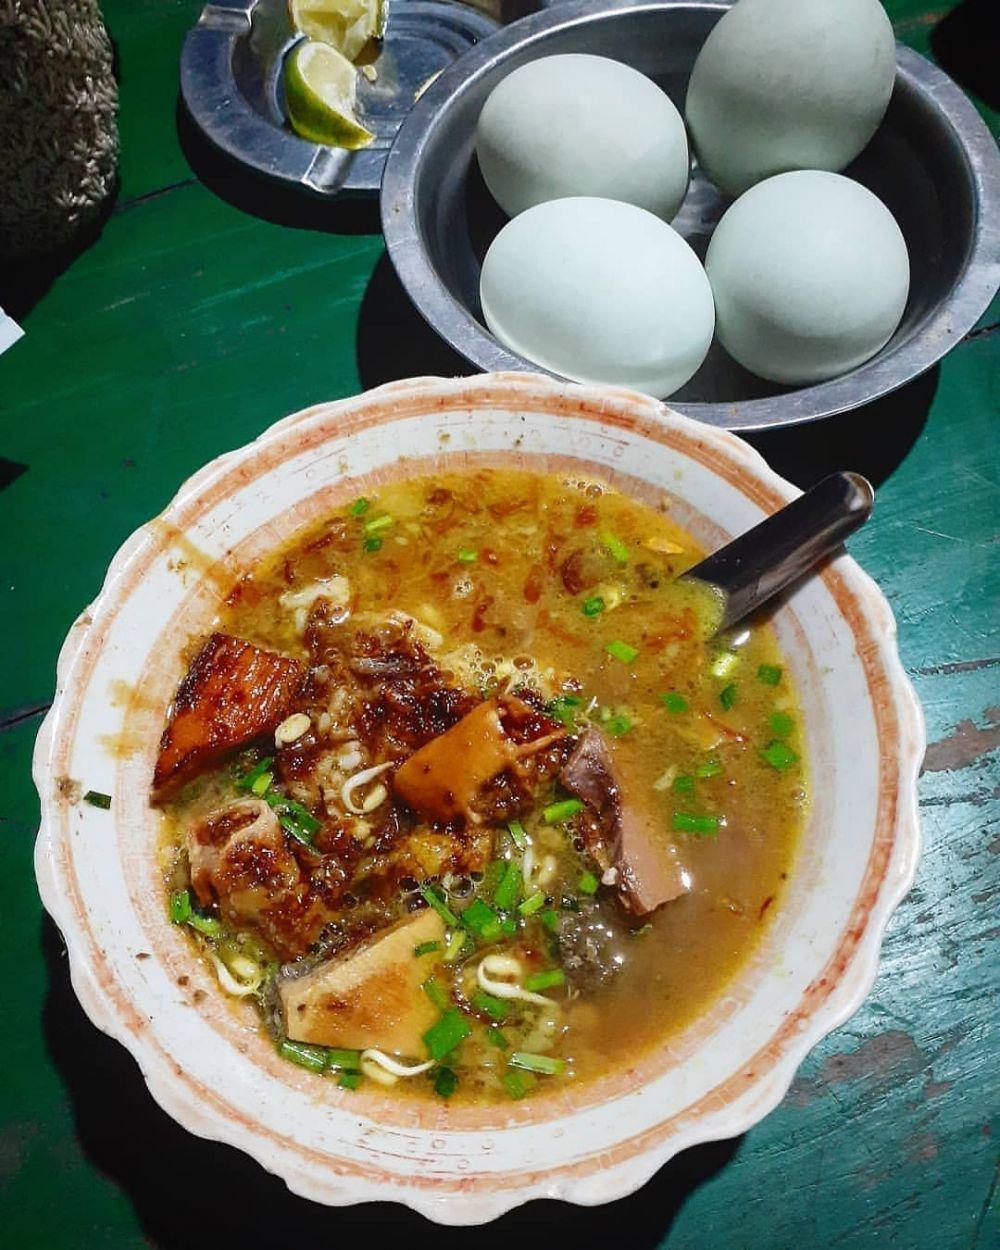 Resep Soto Nusantara C 2020 Brilio Net Resep Makanan Dan Minuman Makanan Pedas